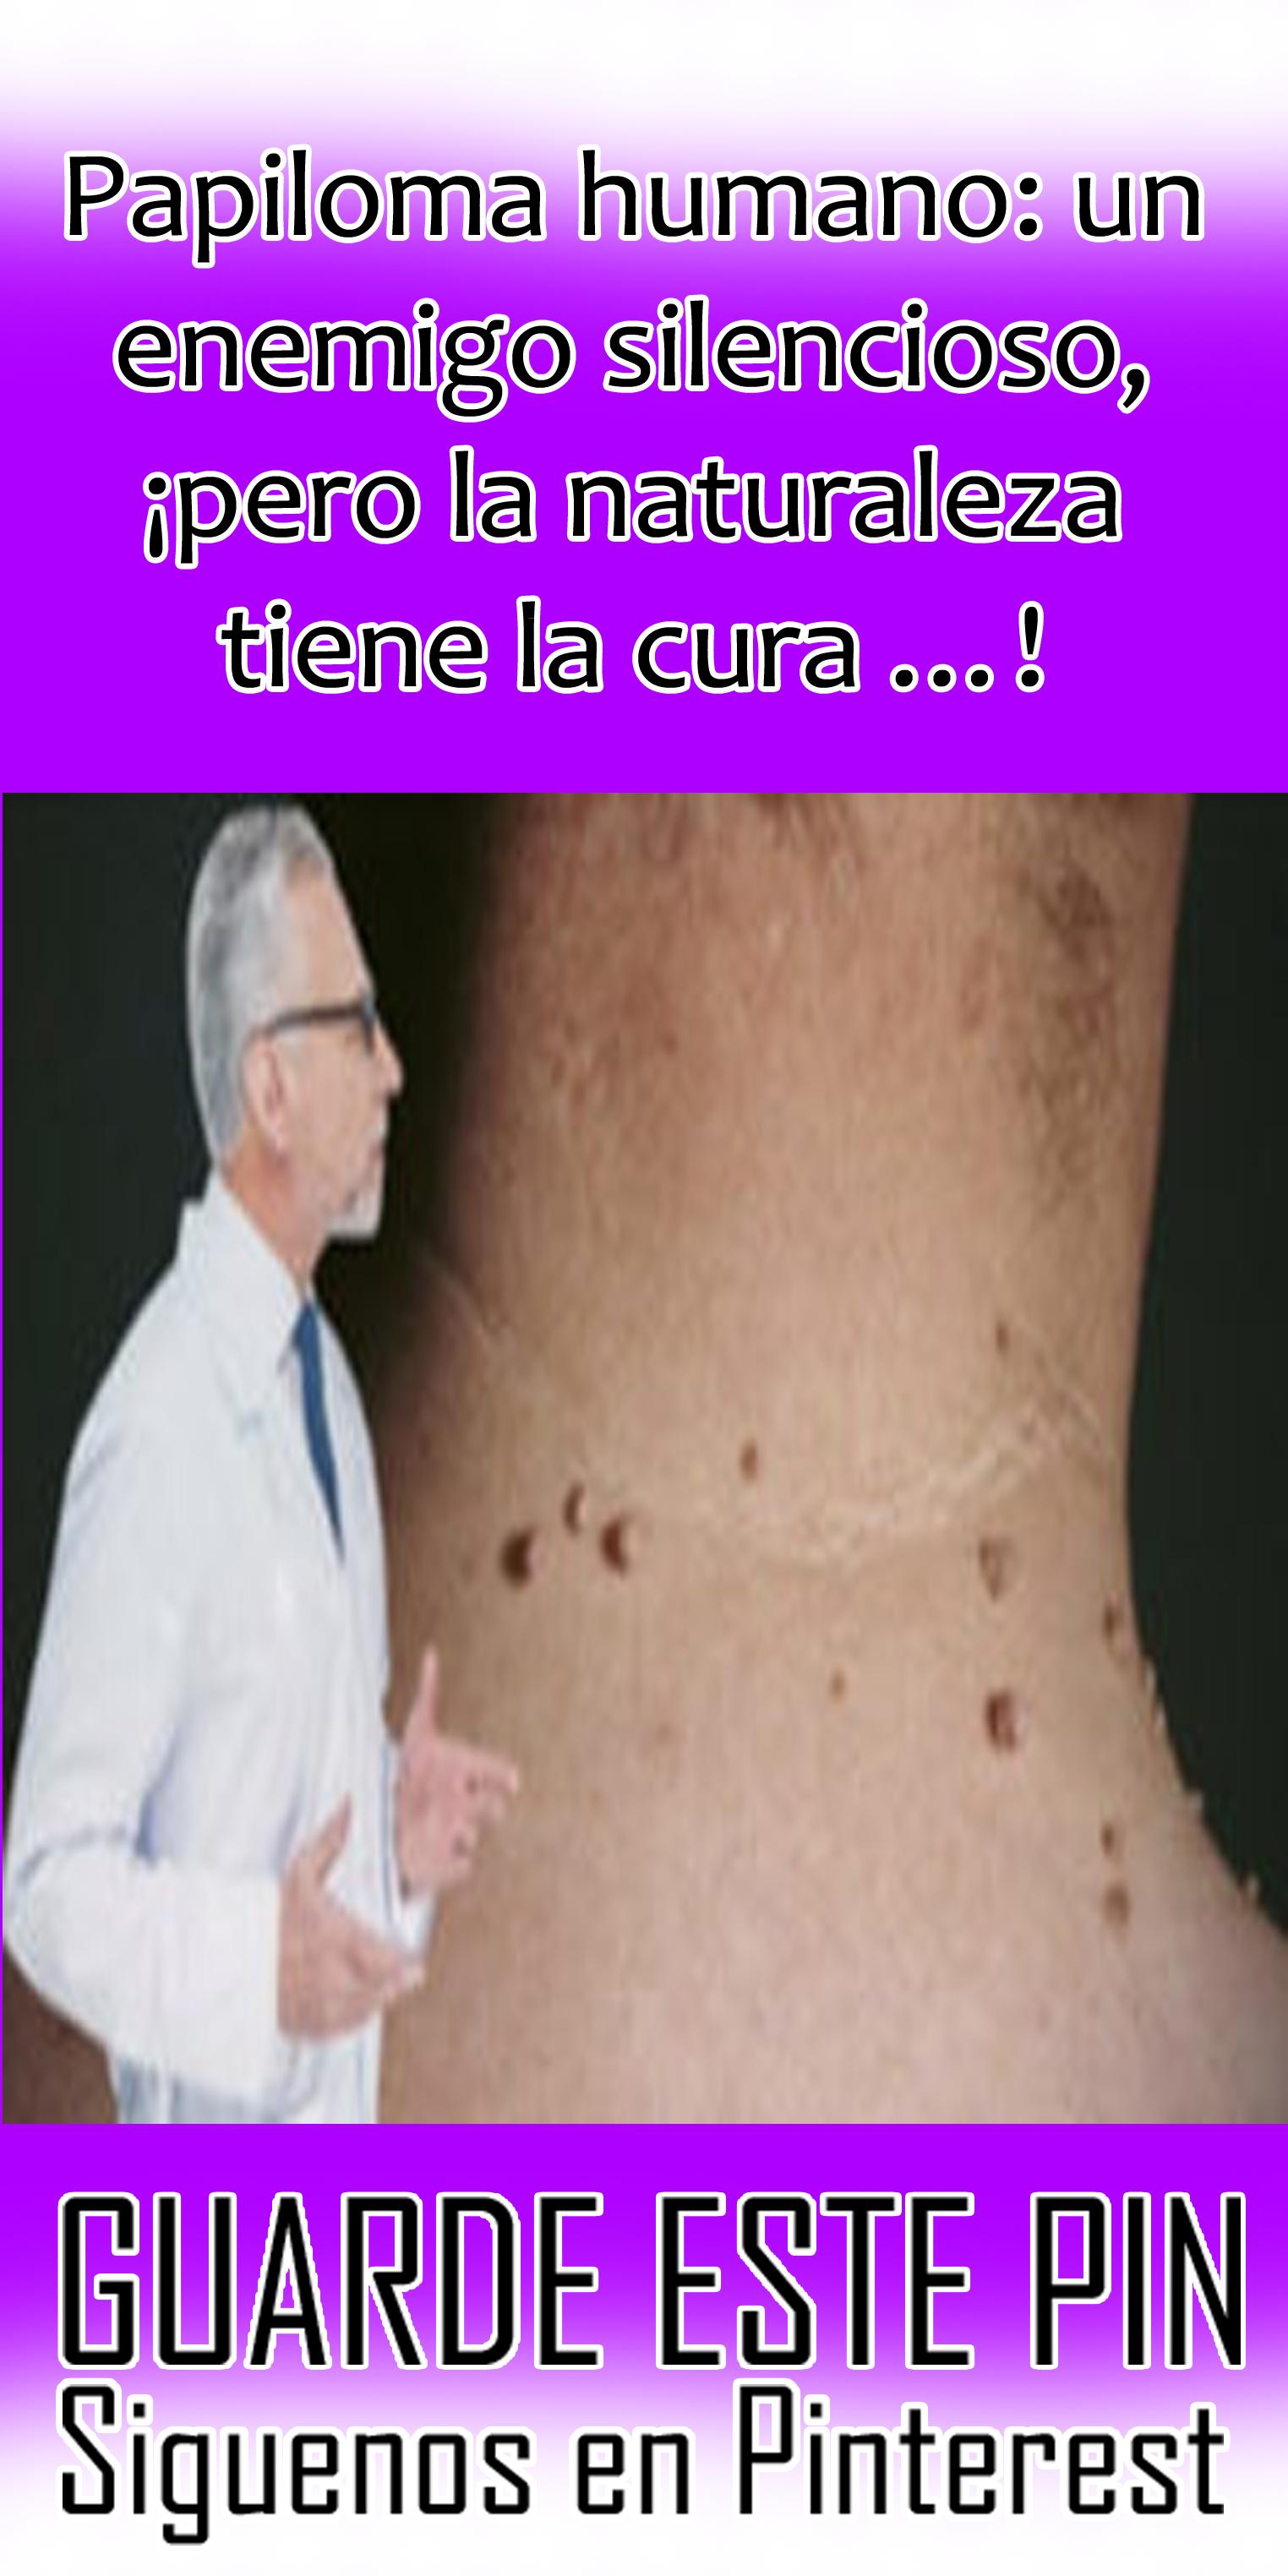 papiloma humano tiene curacion sinonasal papilloma pathology outlines